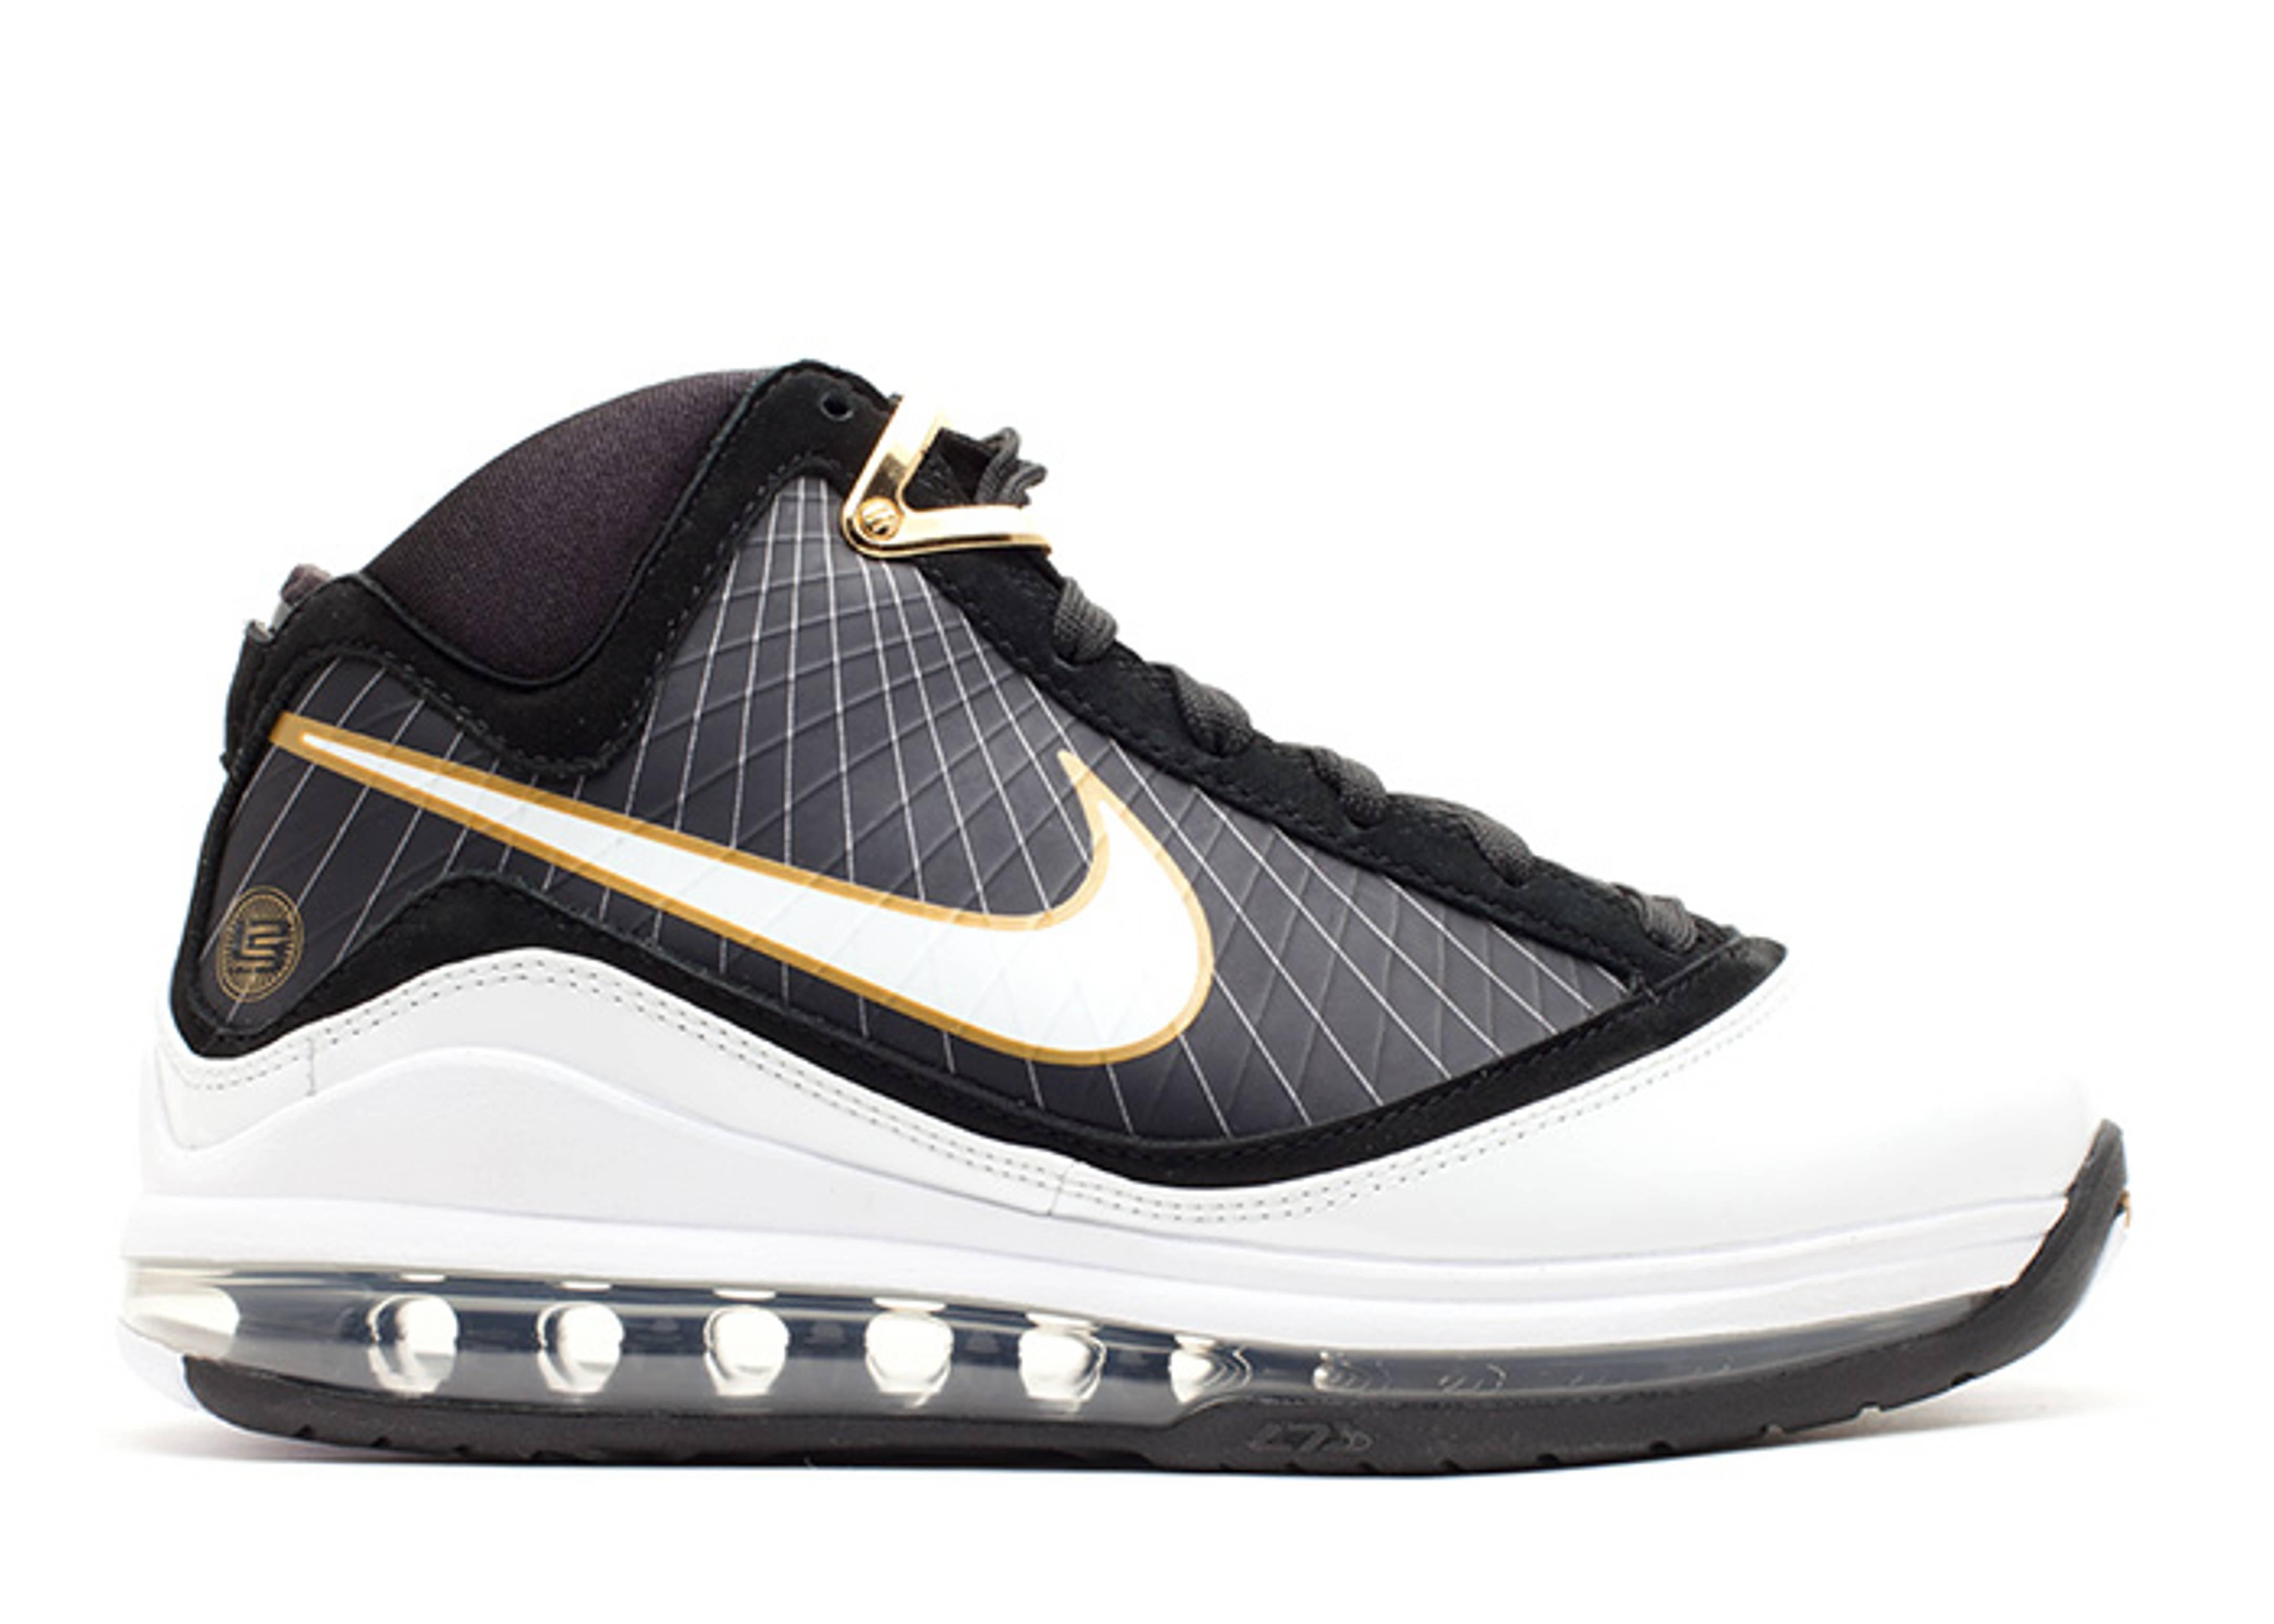 uk availability 8b2e7 005a2 Zoom Lebron 7 (gs) - Nike - 375793 011 - black/white ...